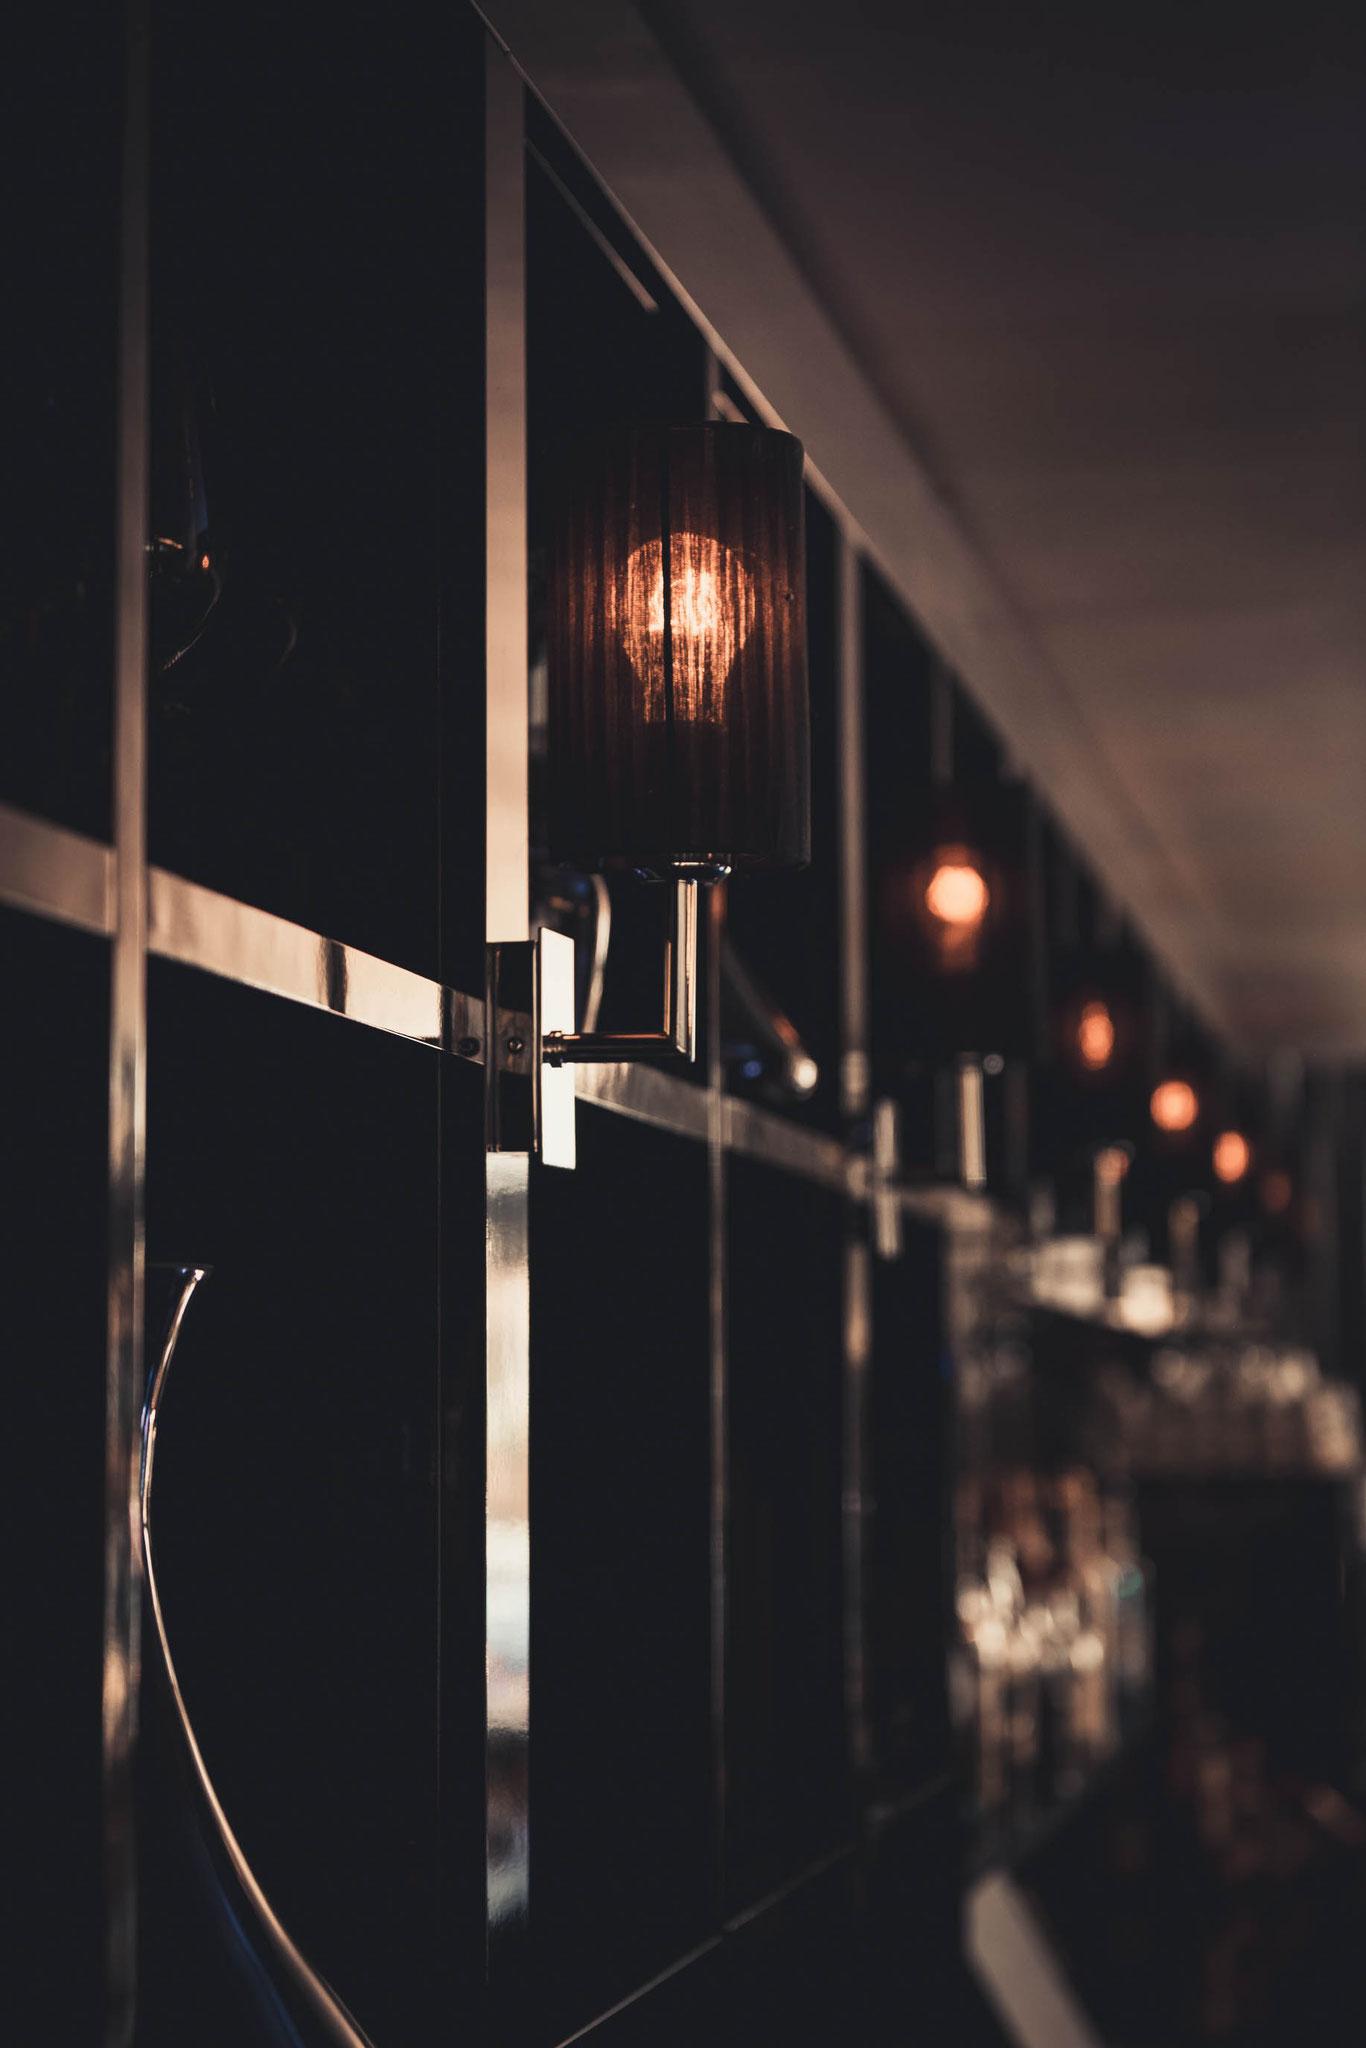 Romantische Beleuchtung